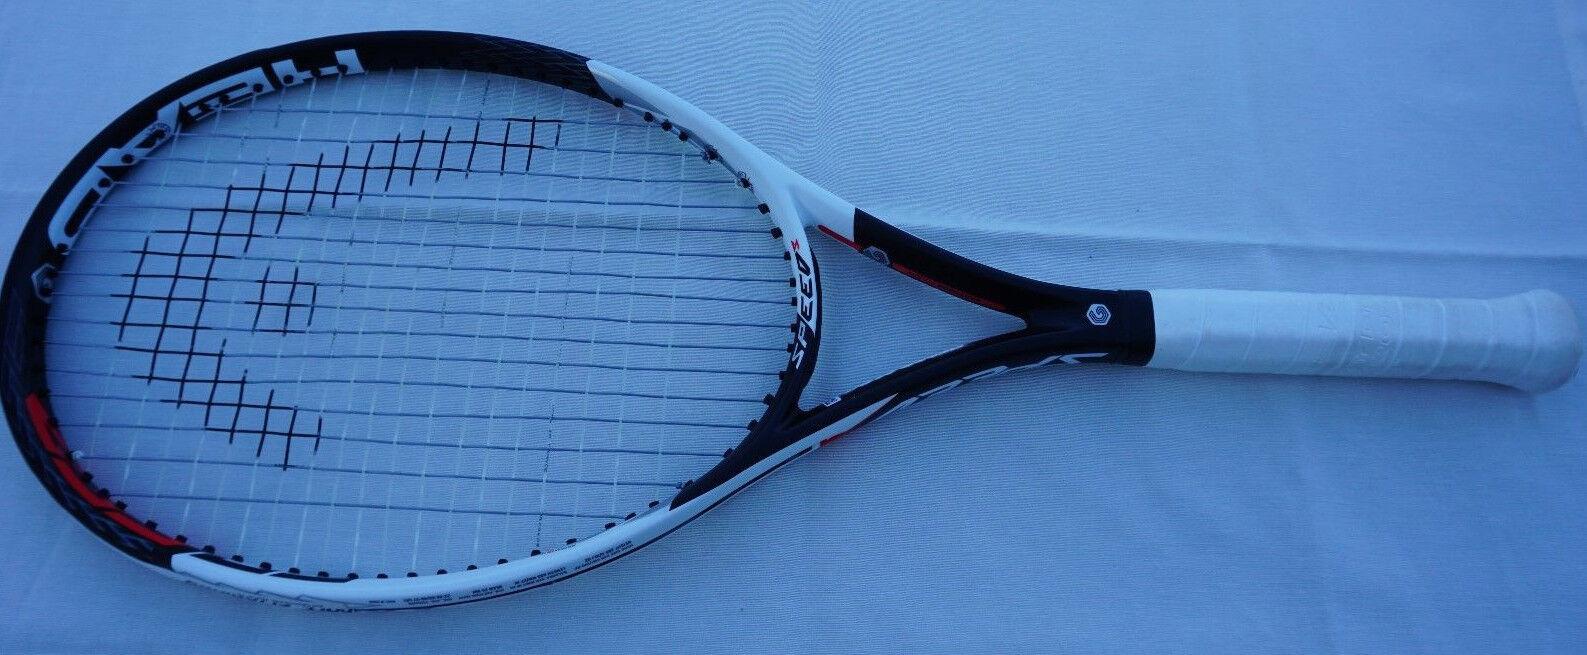 HEAD HEAD HEAD Tennisschläger Graphene Touch Speed S, wie Neu, nur 1 Stunde gespielt 654d7a